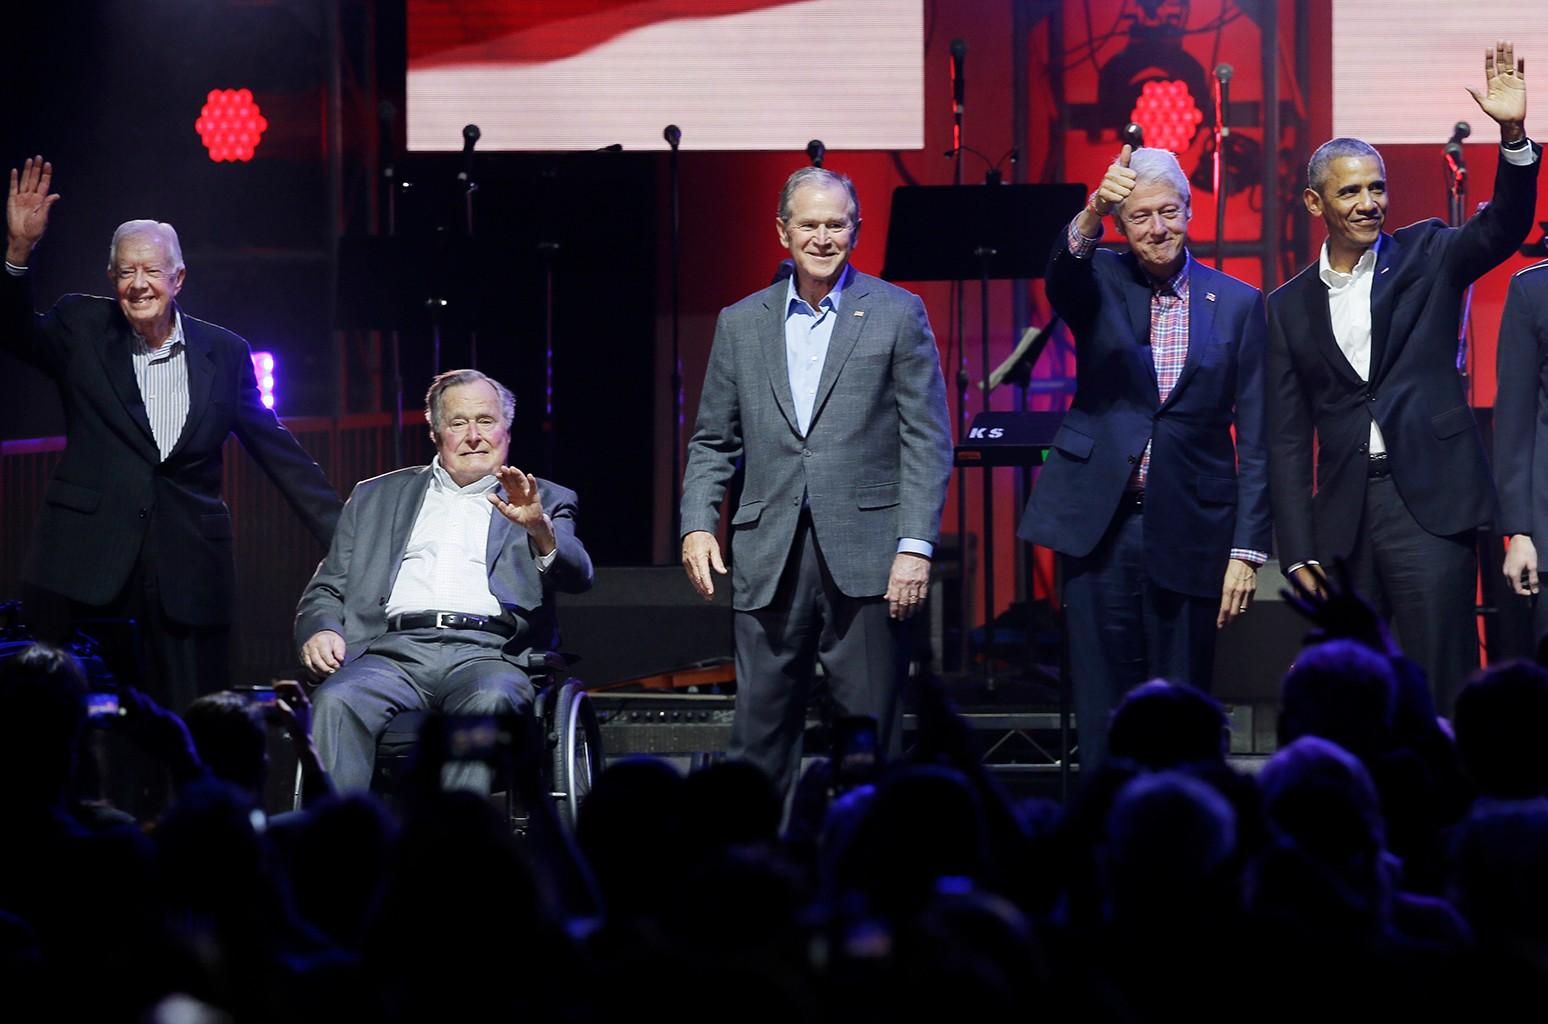 Former Presidents - Hurricane Relief Concert 2017